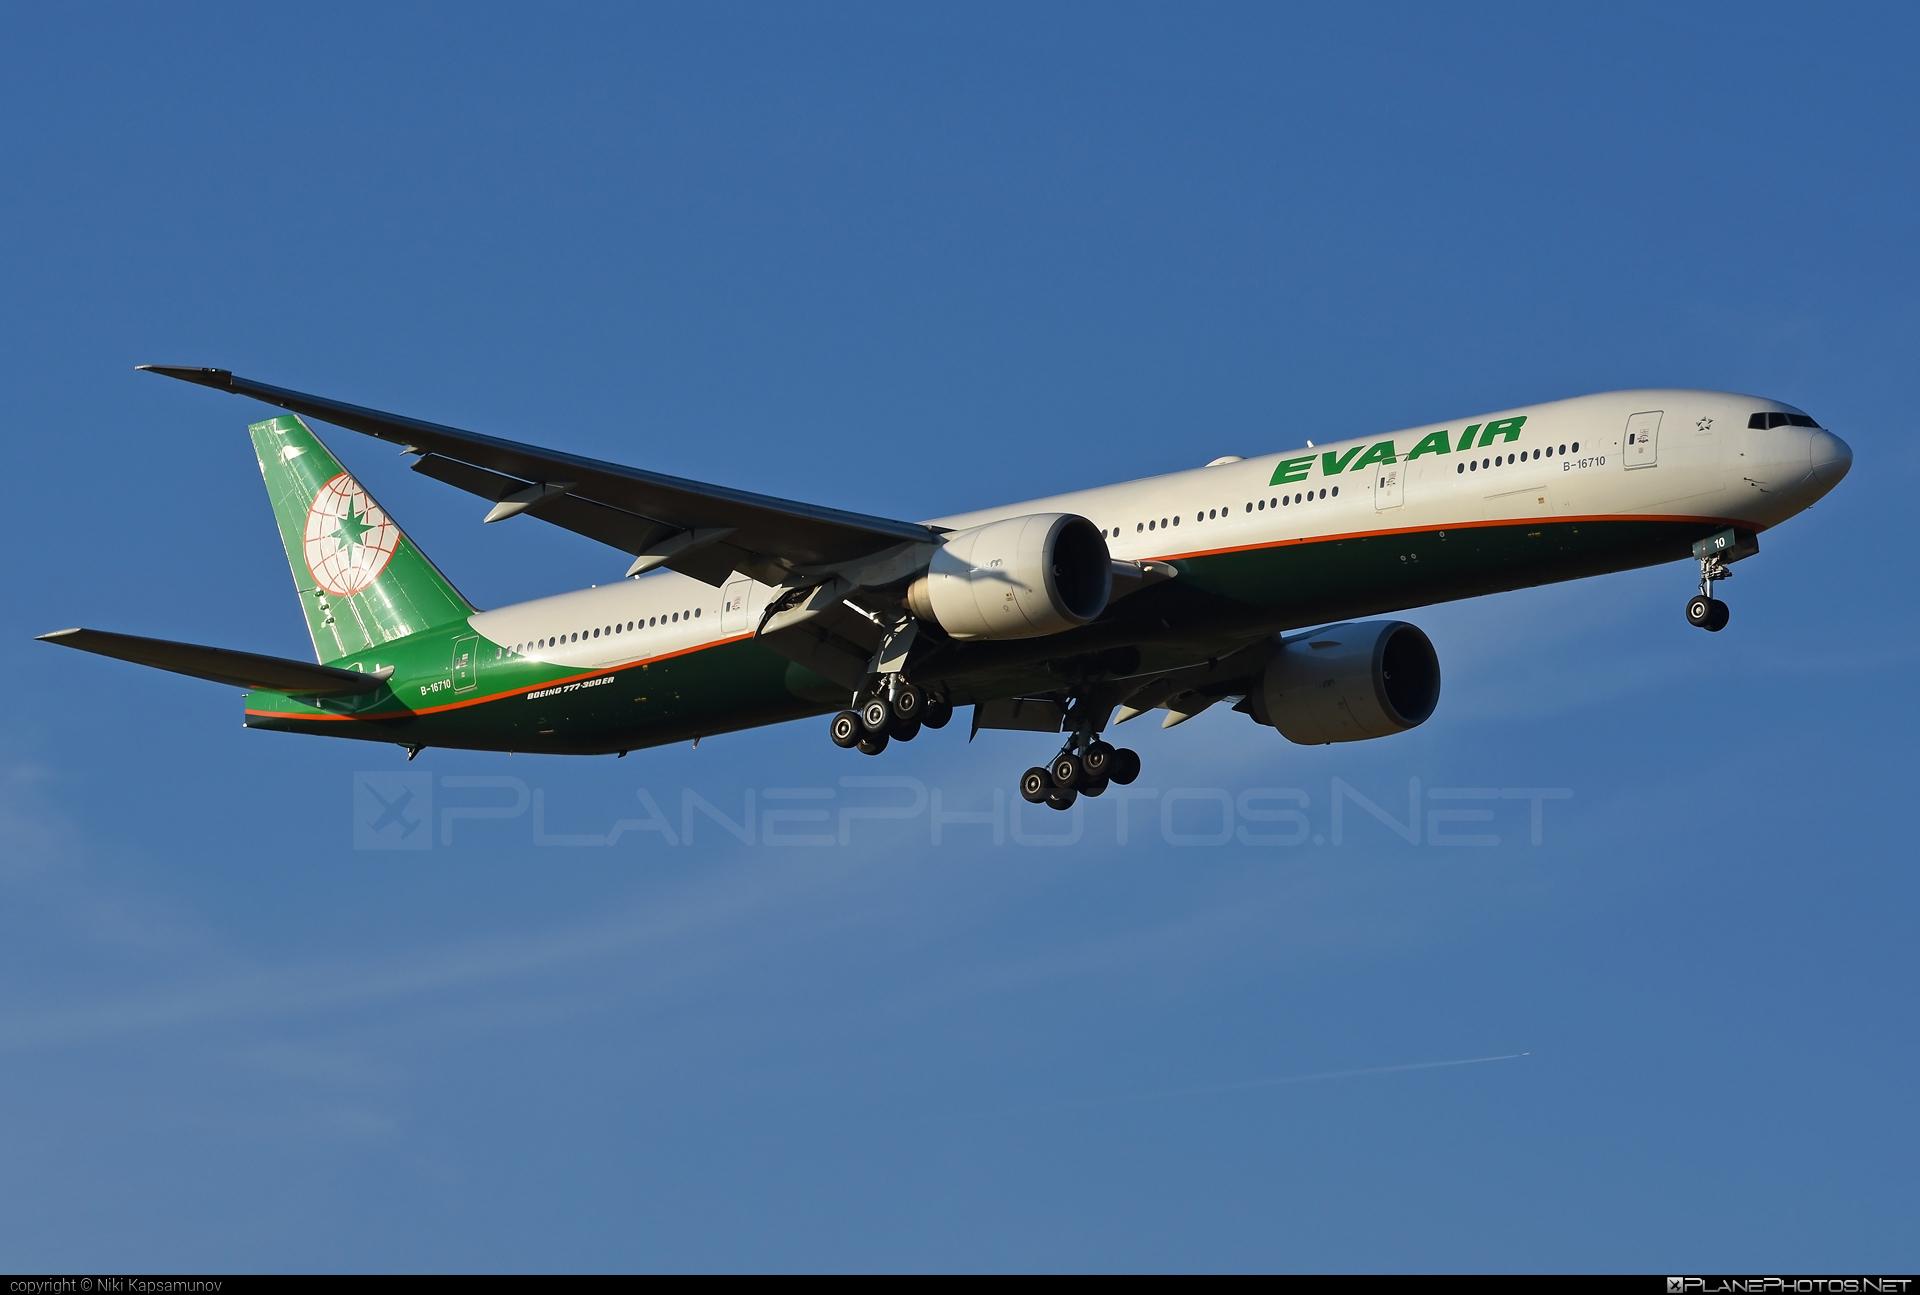 Boeing 777-300ER - B-16710 operated by EVA Air #b777 #b777er #boeing #boeing777 #tripleseven